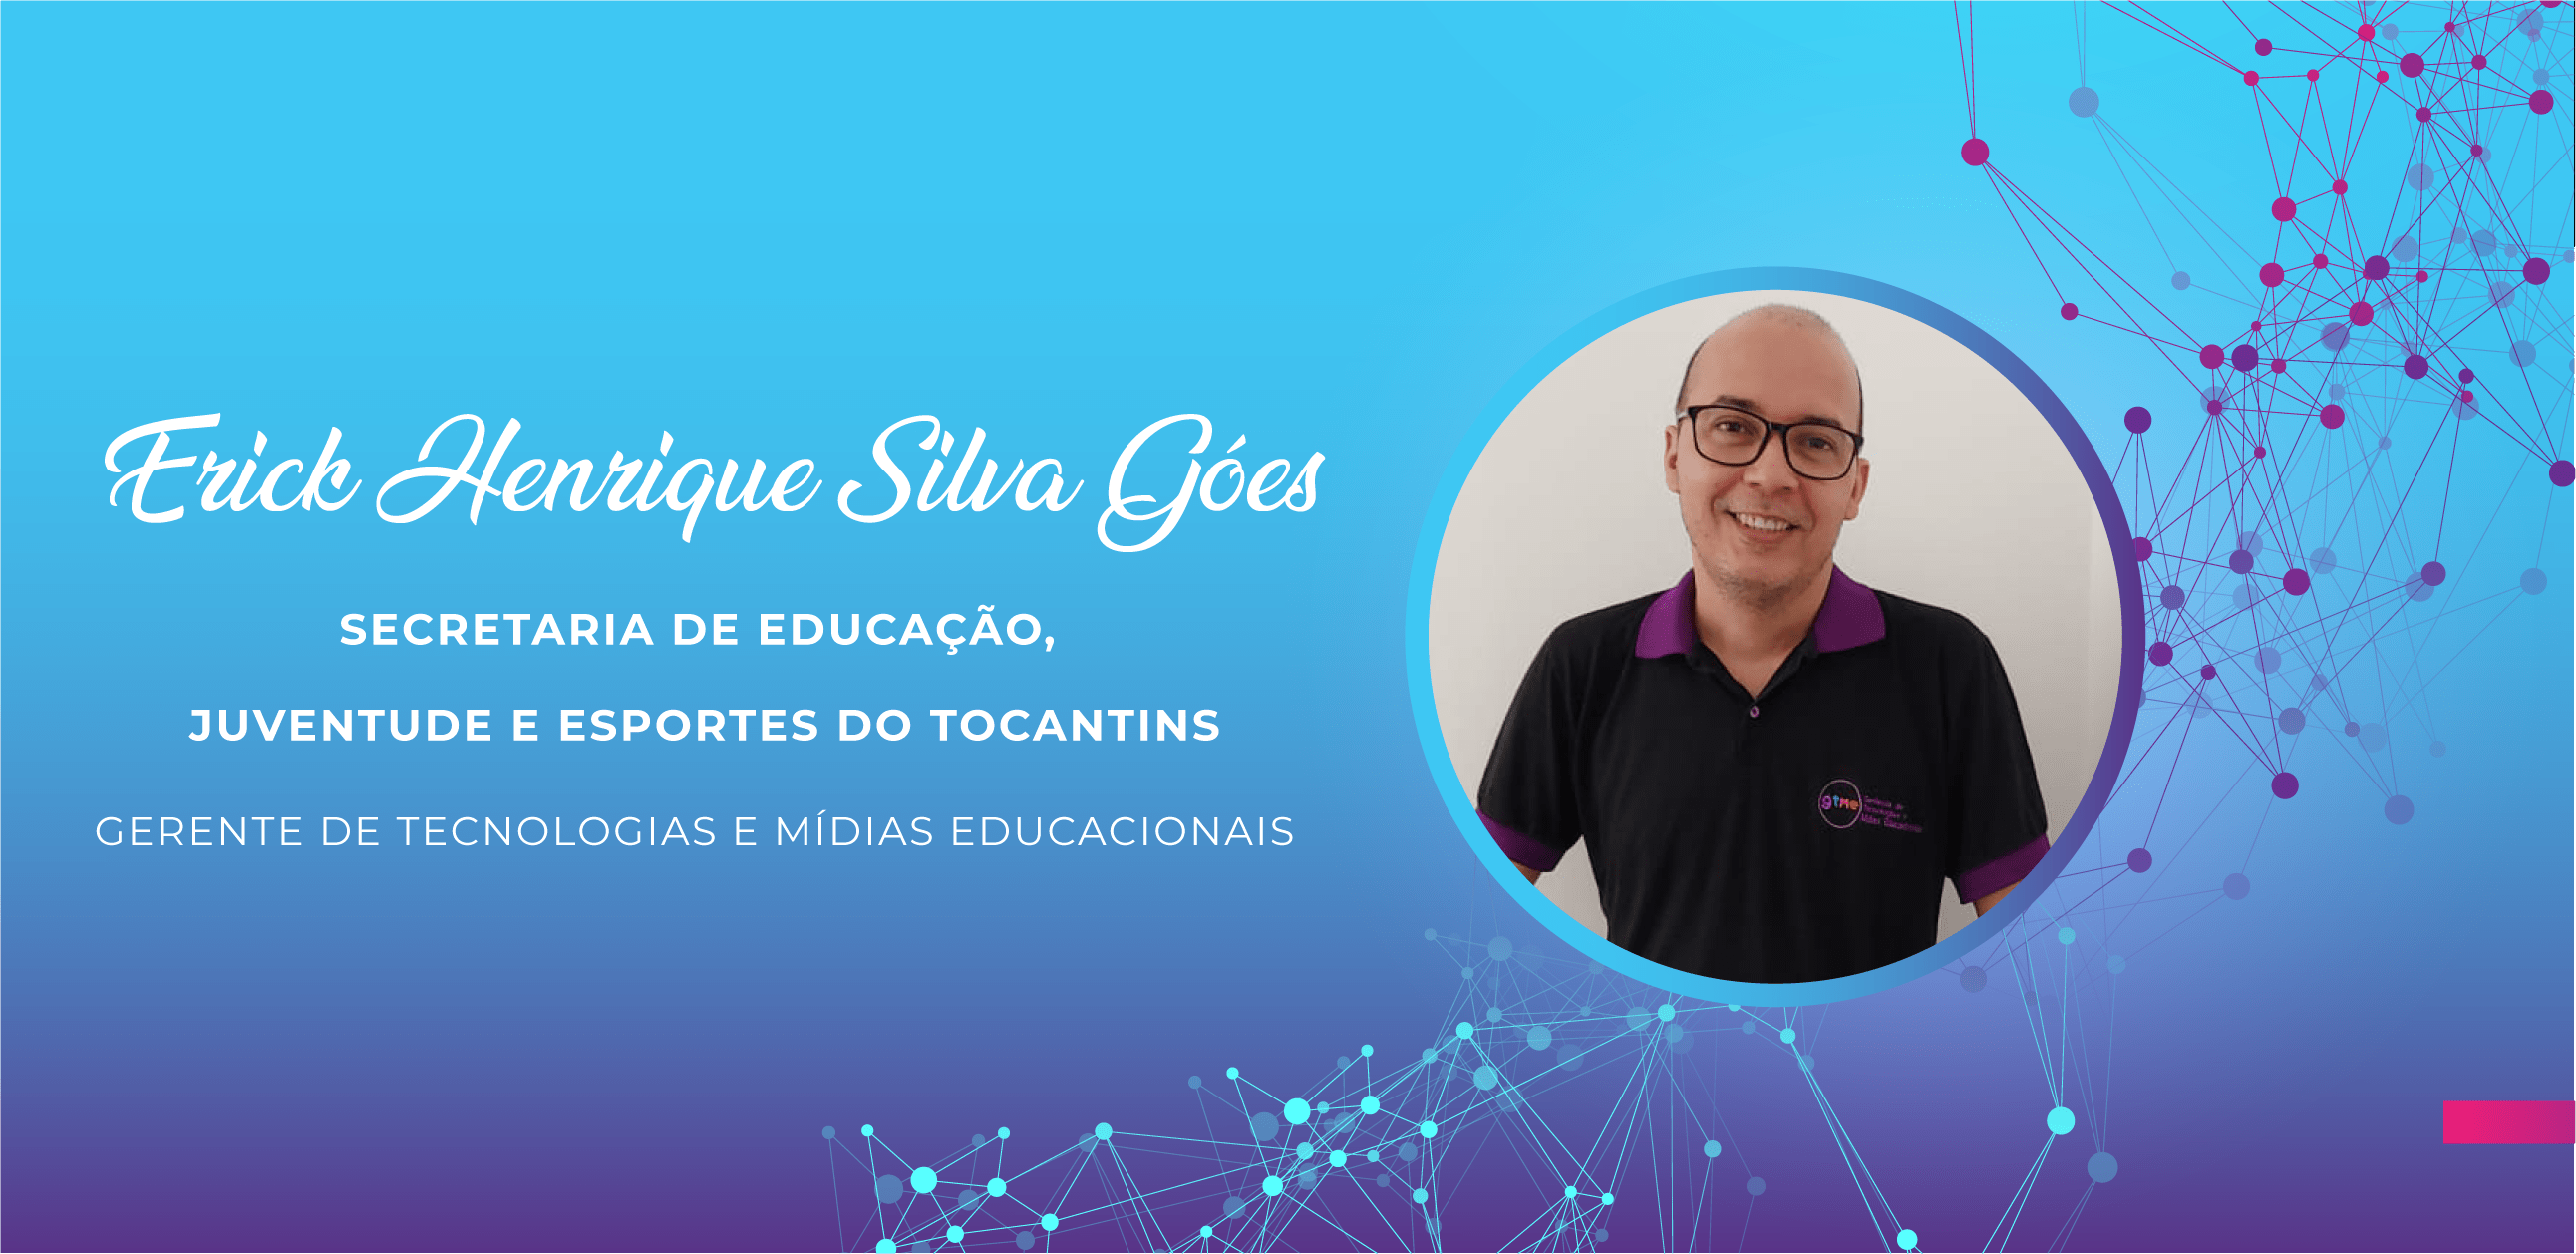 Erick Henrique Silva Góes